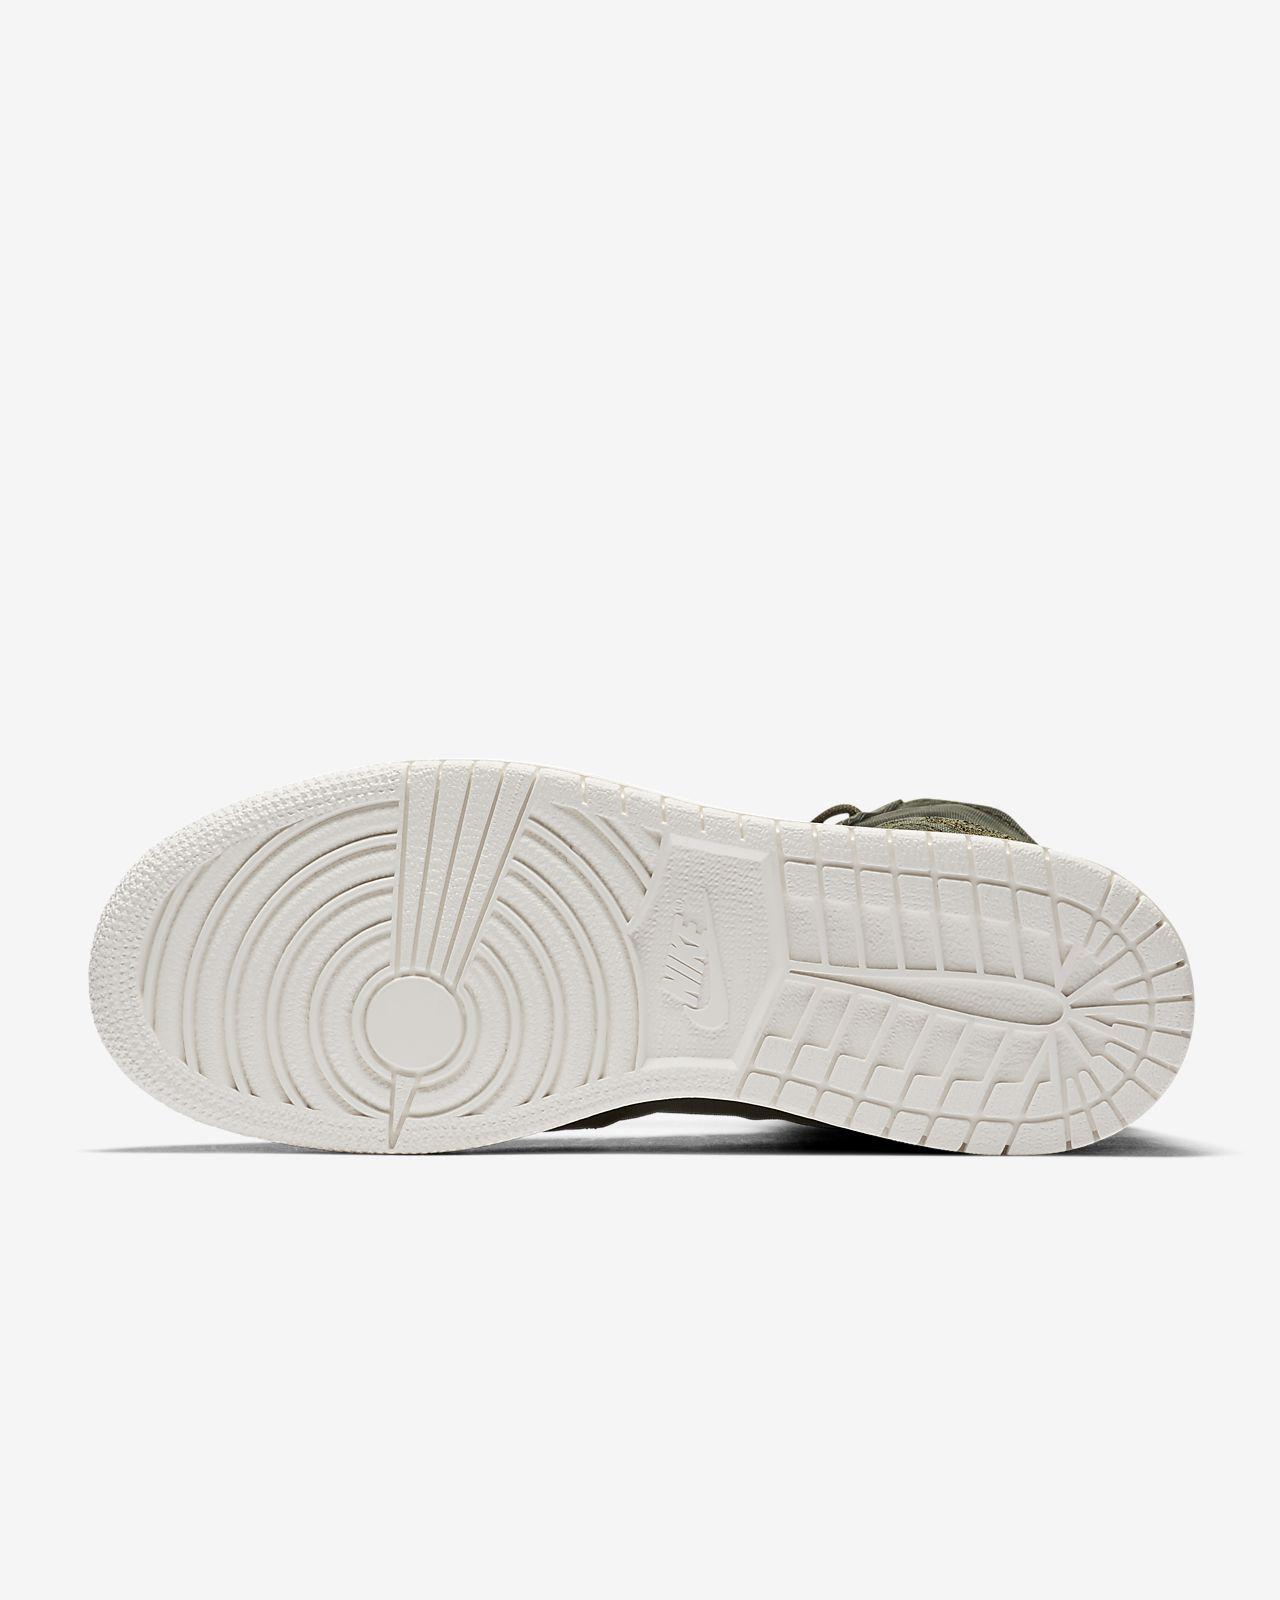 best service 129f5 76005 Air Jordan 1 Explorer XX - sko til kvinder. Nike.com DK